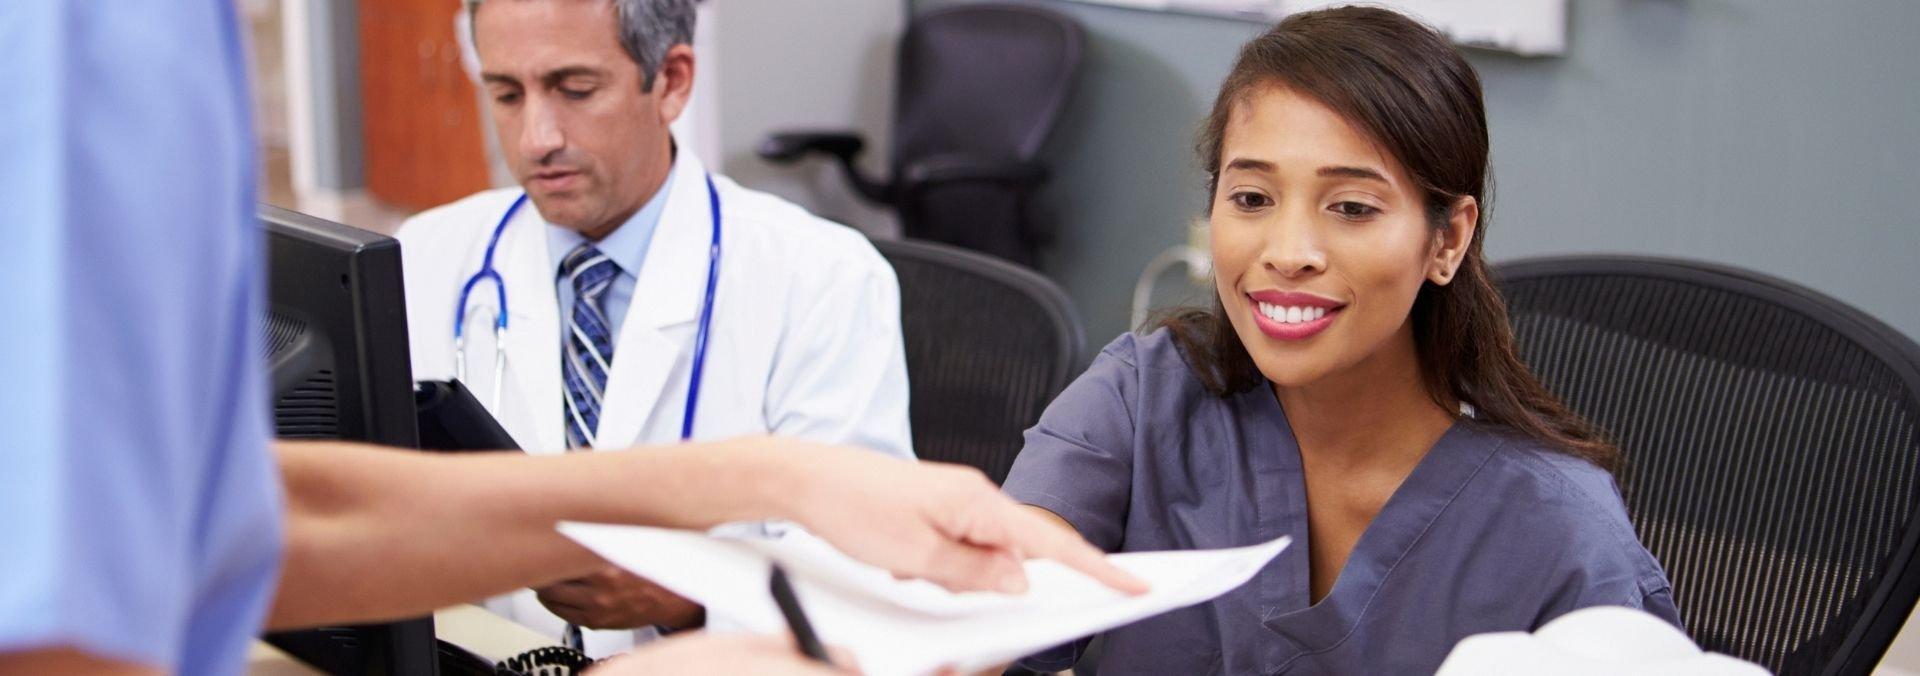 health unit coordinator professional